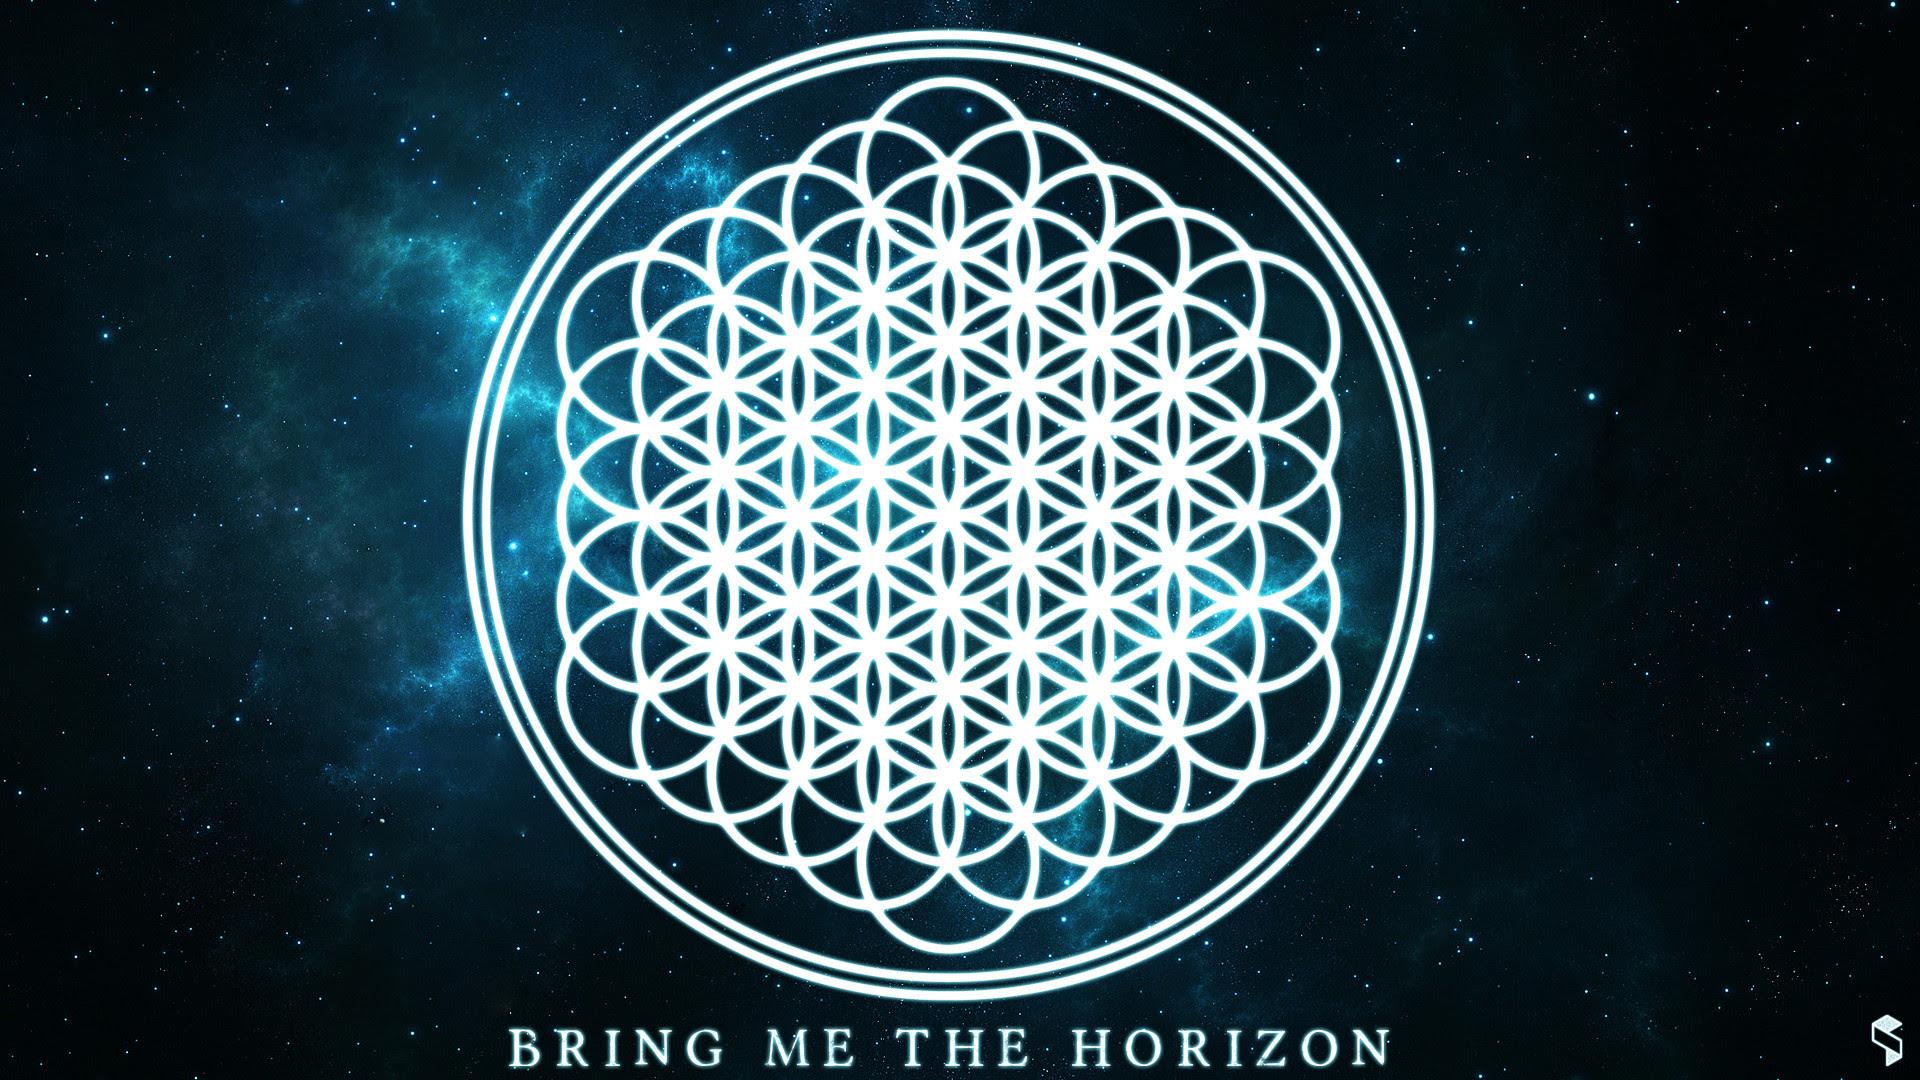 Bring Me The Horizon 2018 Wallpaper 63 Images